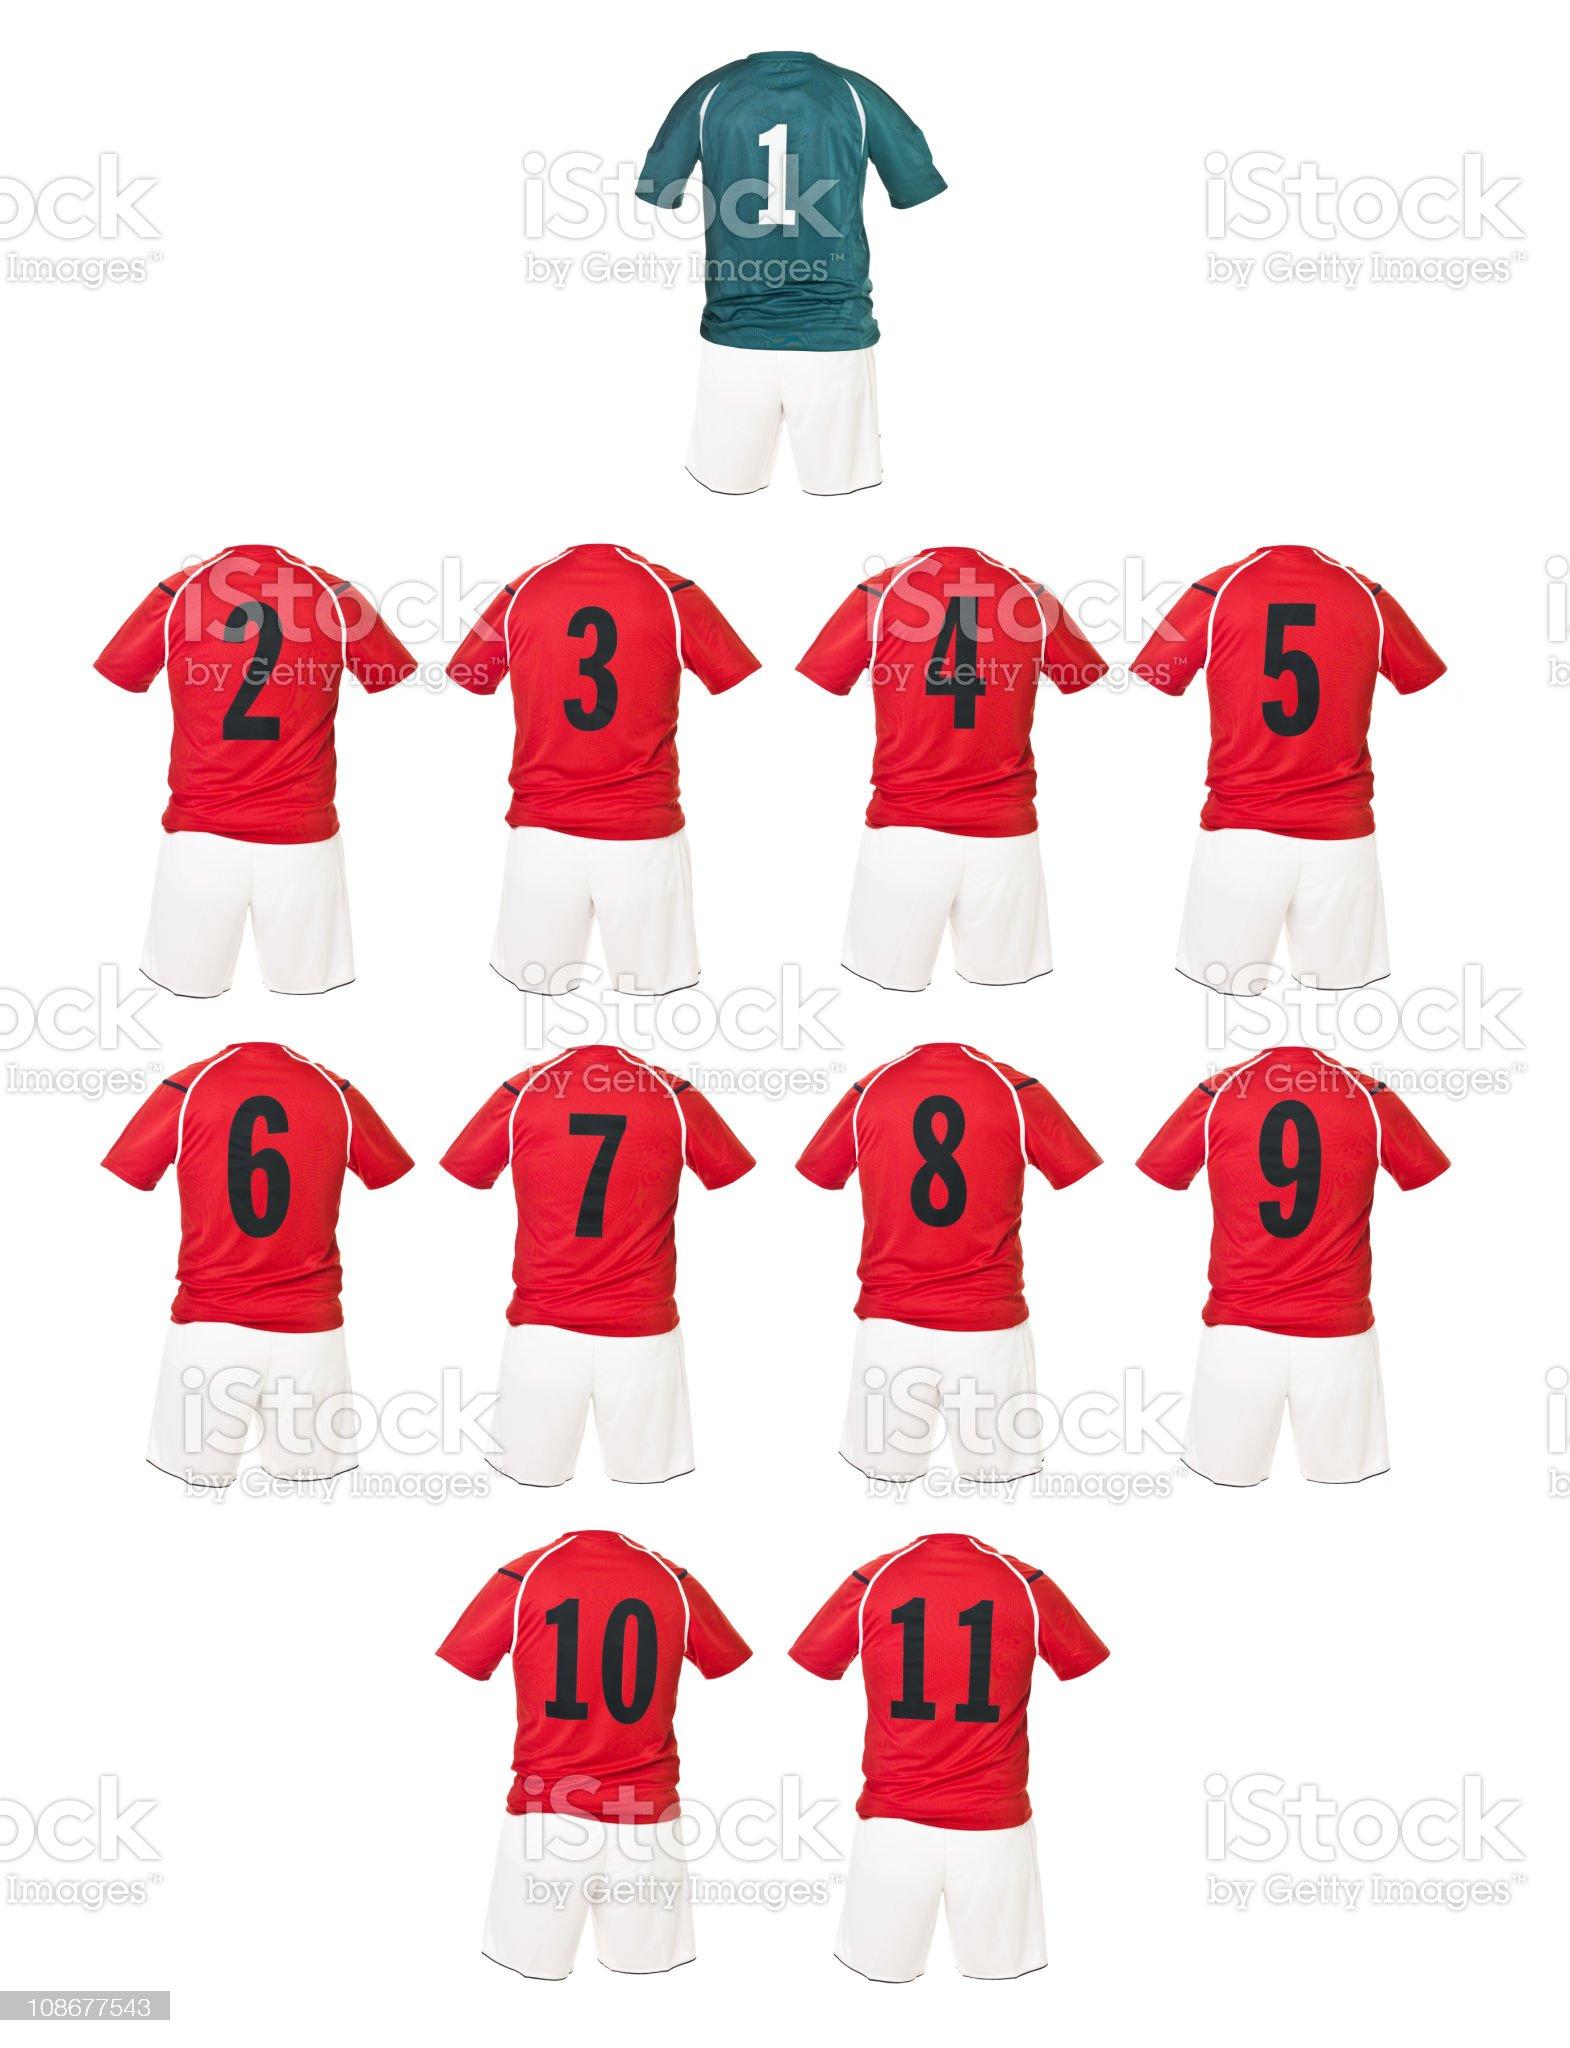 Red Football team shirts royalty-free stock photo